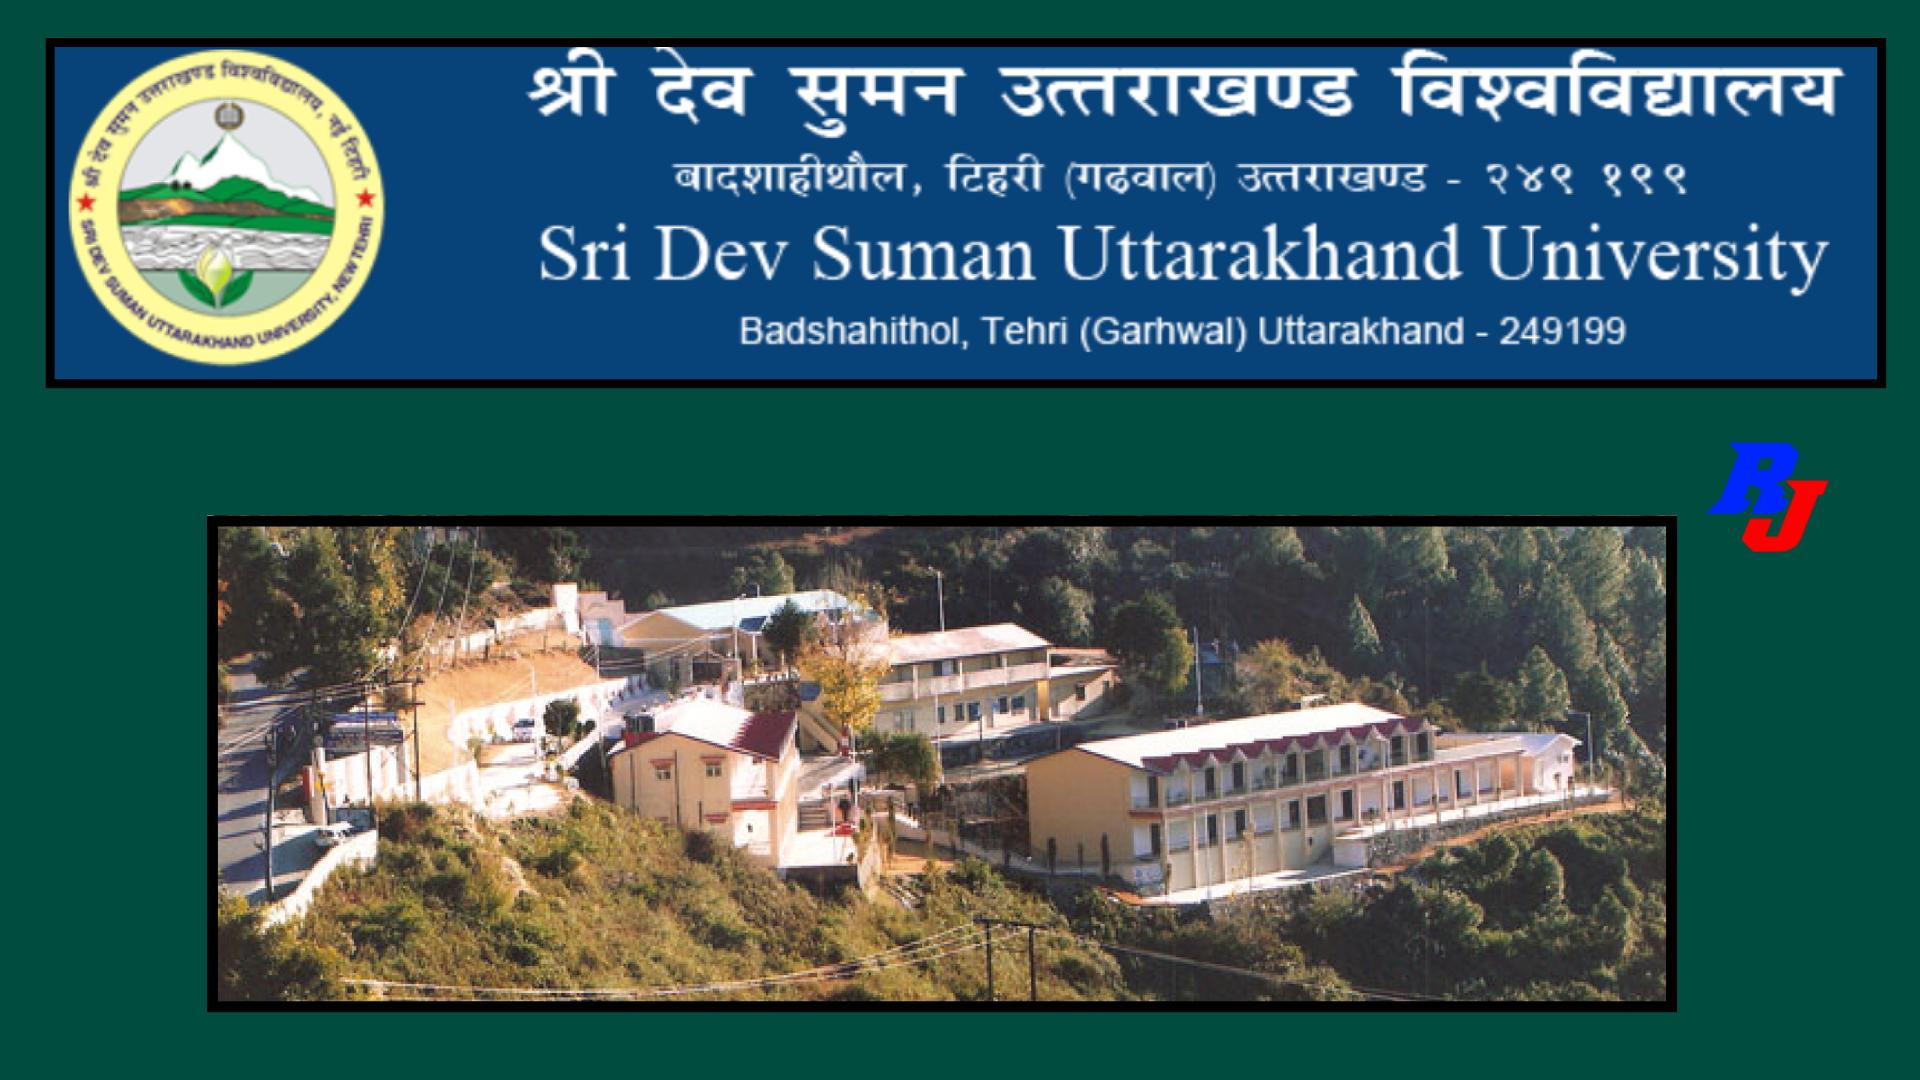 Faculty Positions at SDSUV (Regular), Uttarakhand, India: Total Post = 44